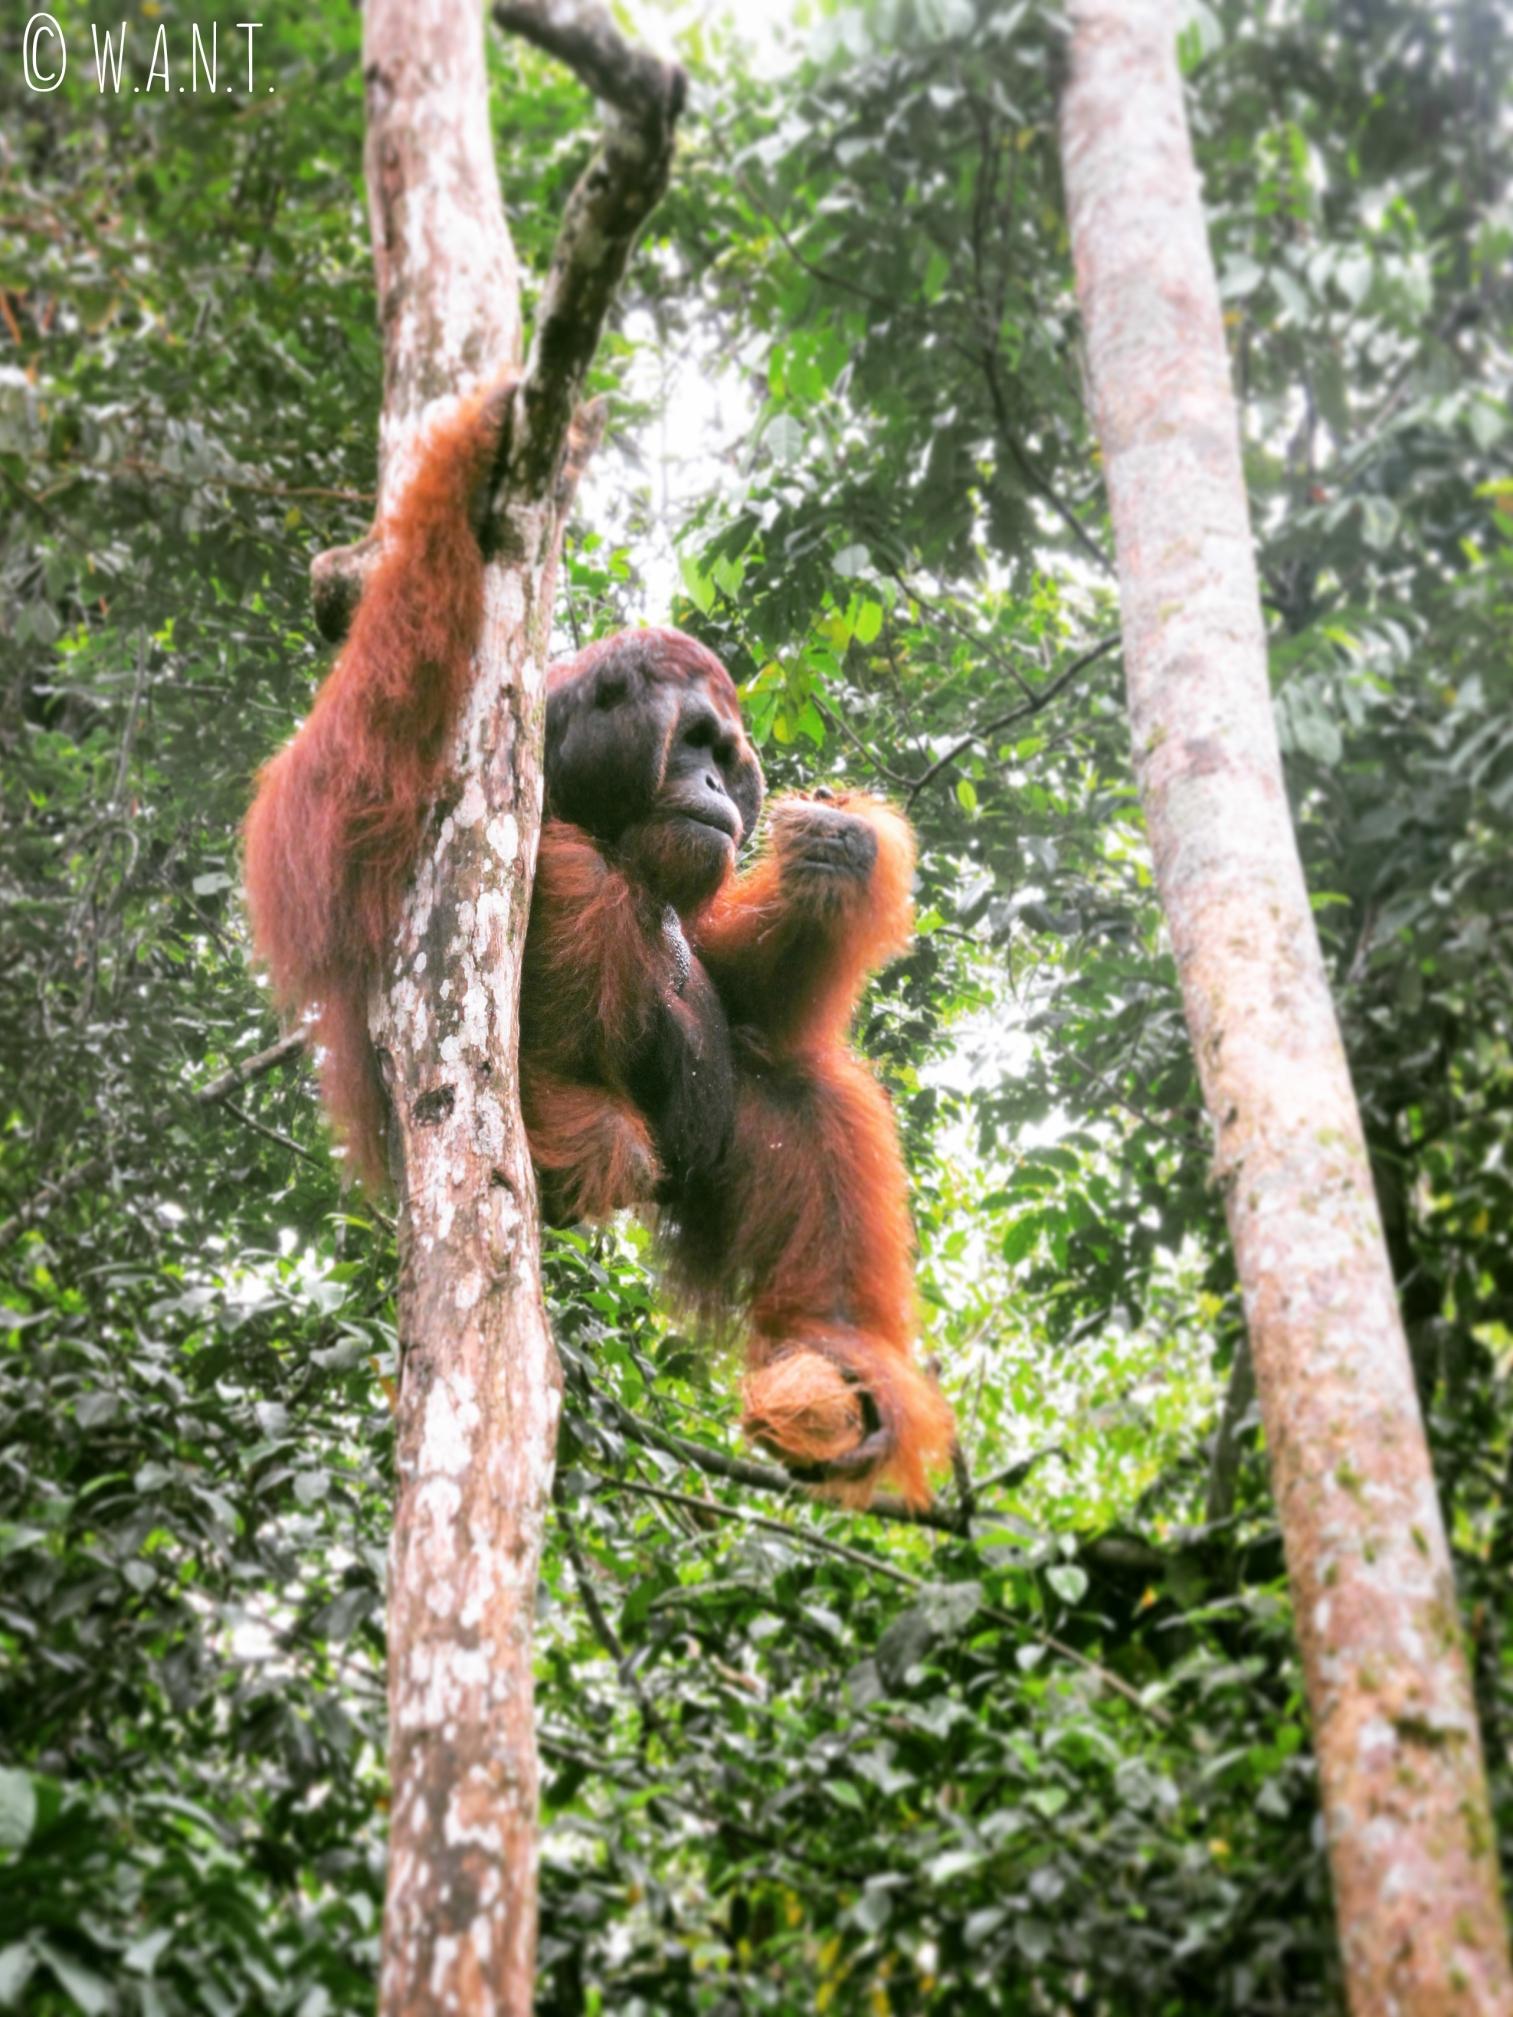 Ricchie, orang-outan du Semenggoh Nature Reserve